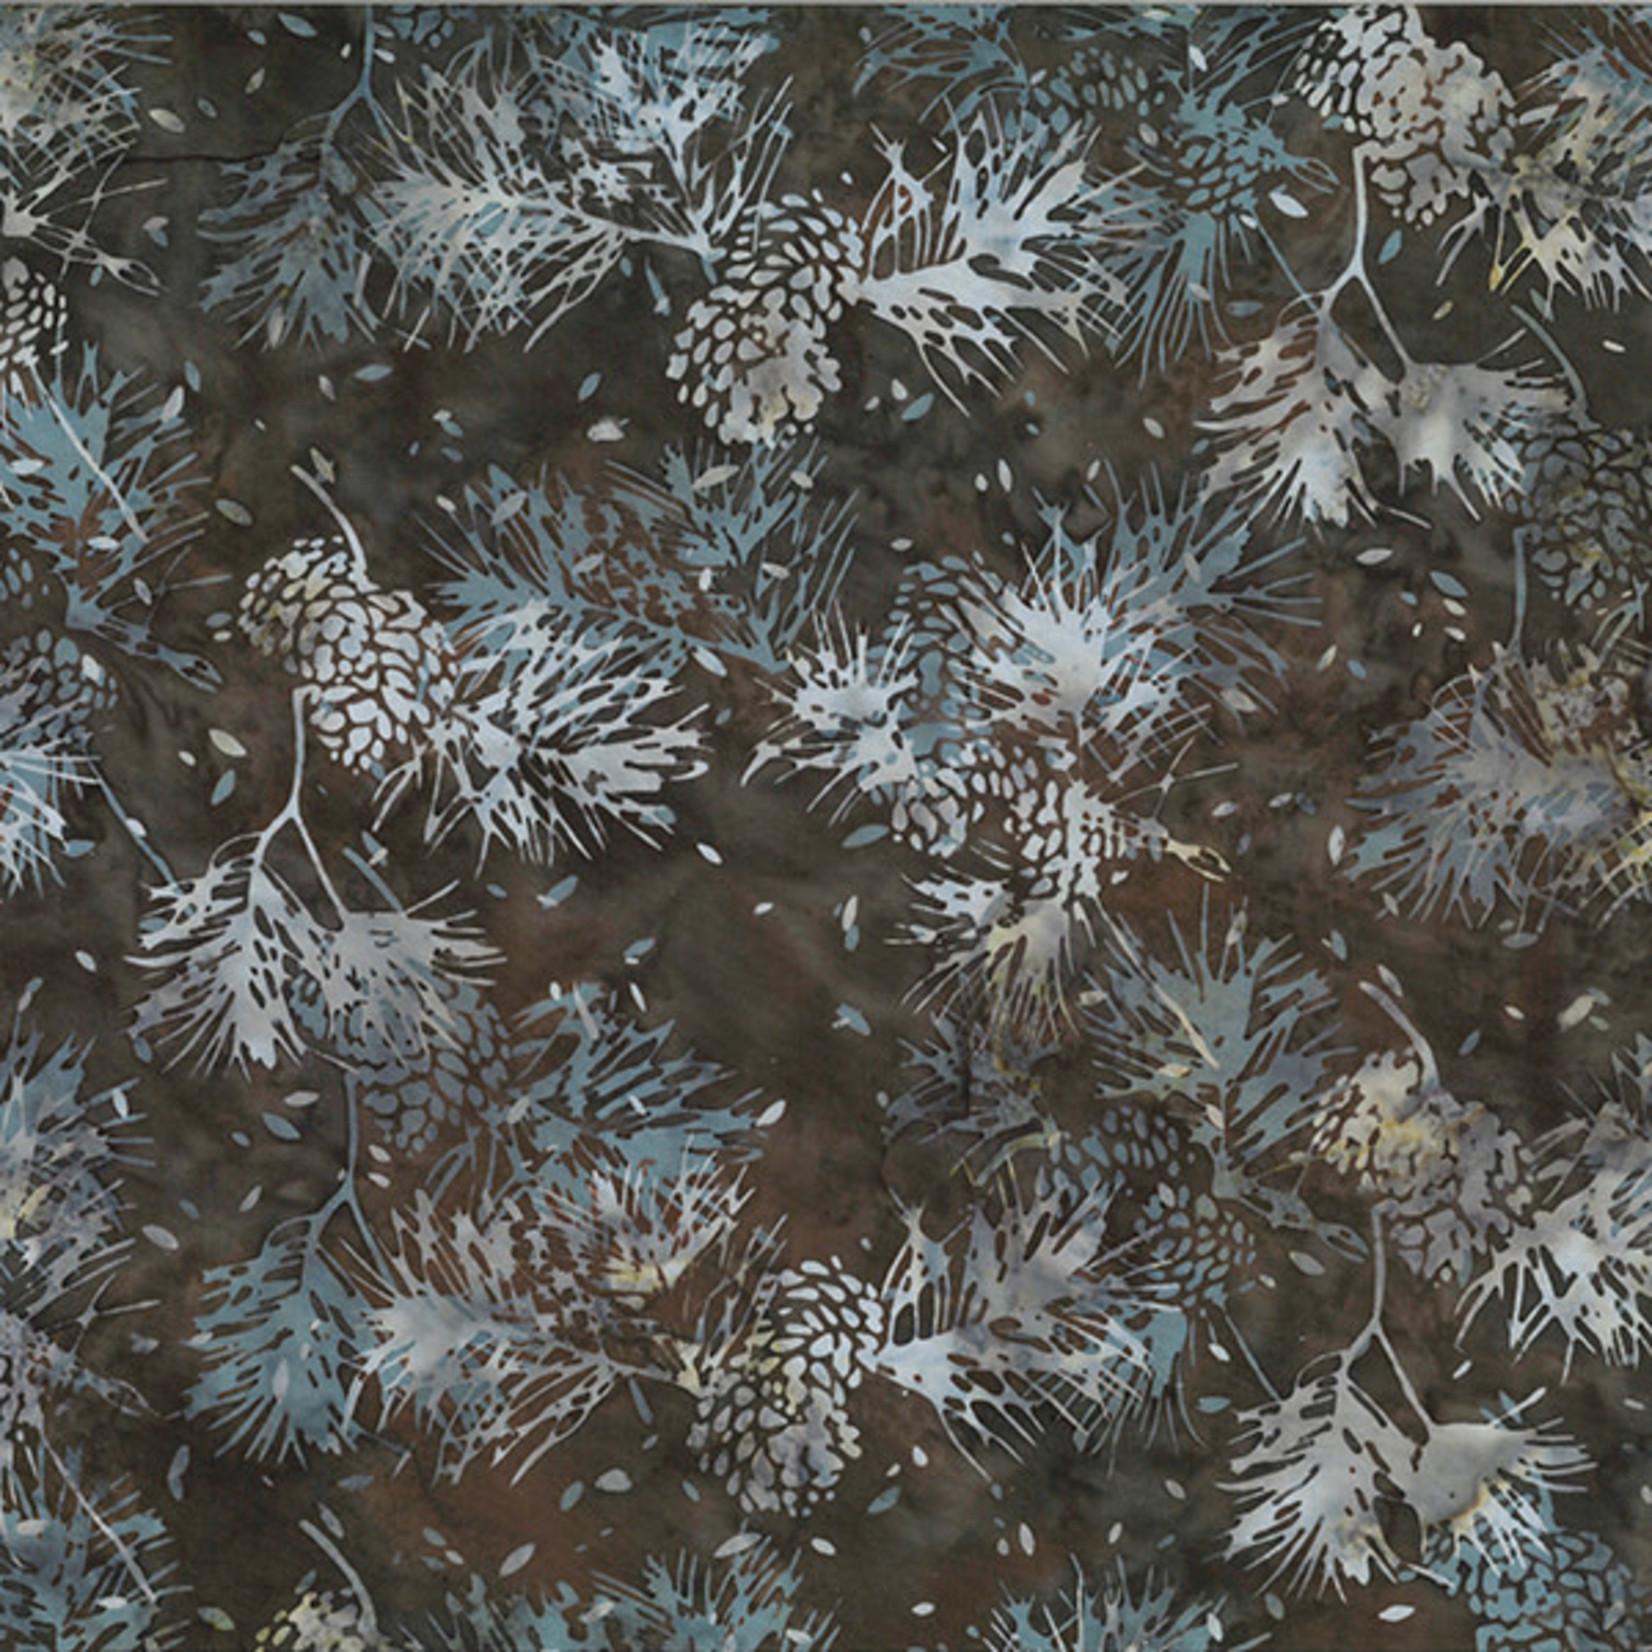 Hoffman Fabrics Bali Batik Pinecone - Walnut